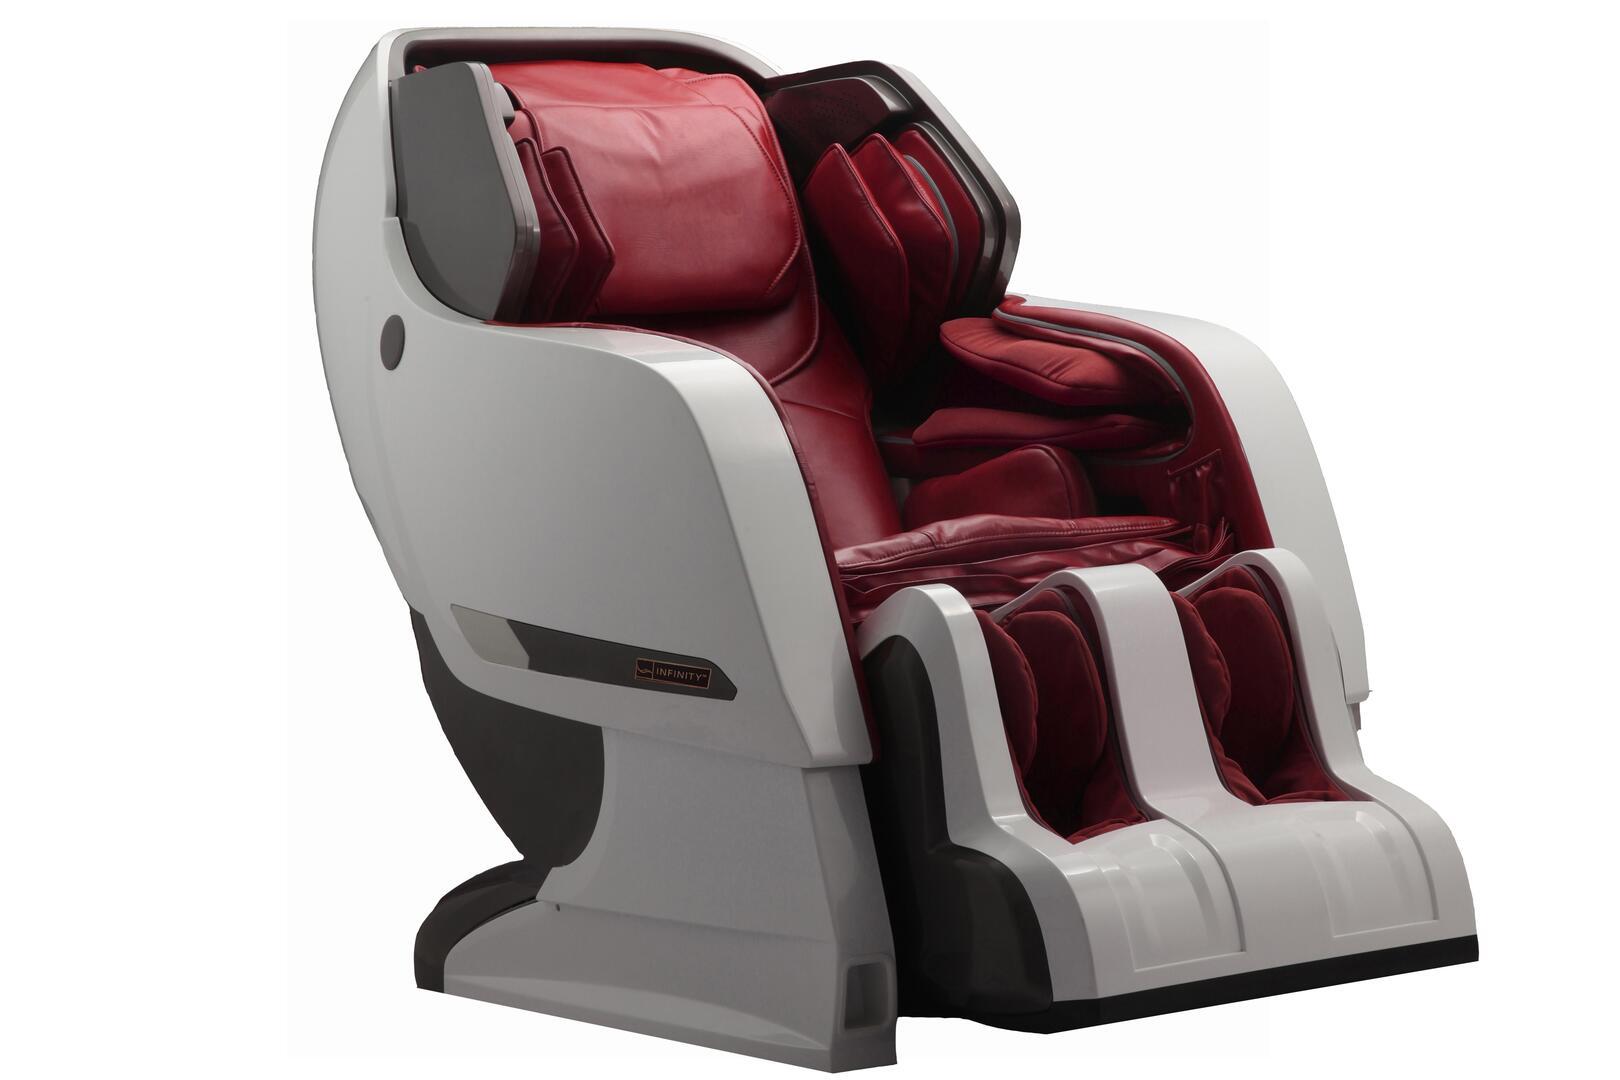 fujita massage chair review fisher price high space saver infinity iyashiwcx202 full body shiatsu swedish